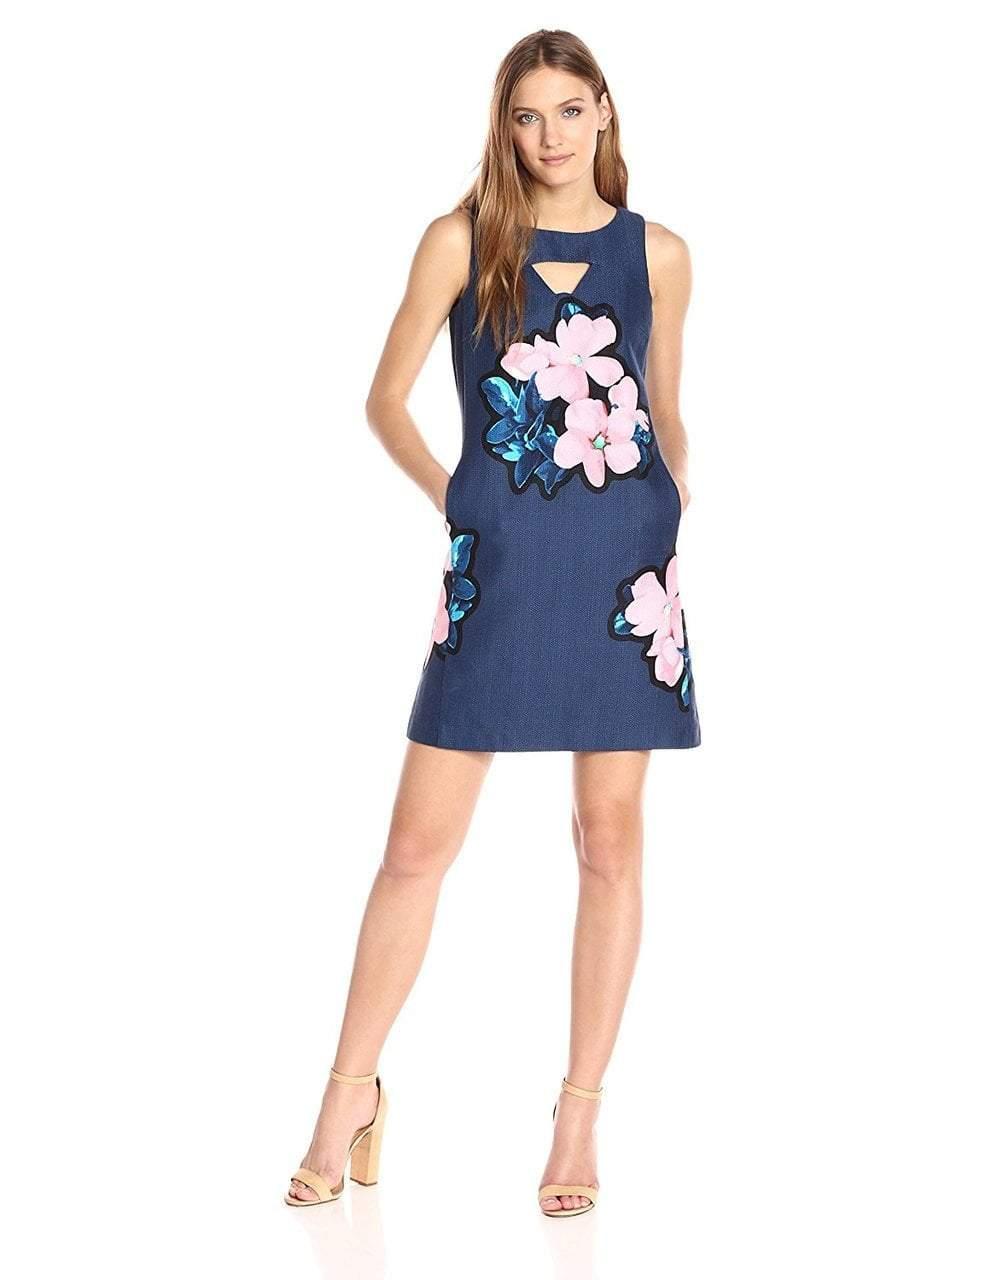 Taylor - Bateau Neck Sheath Dress 8836M